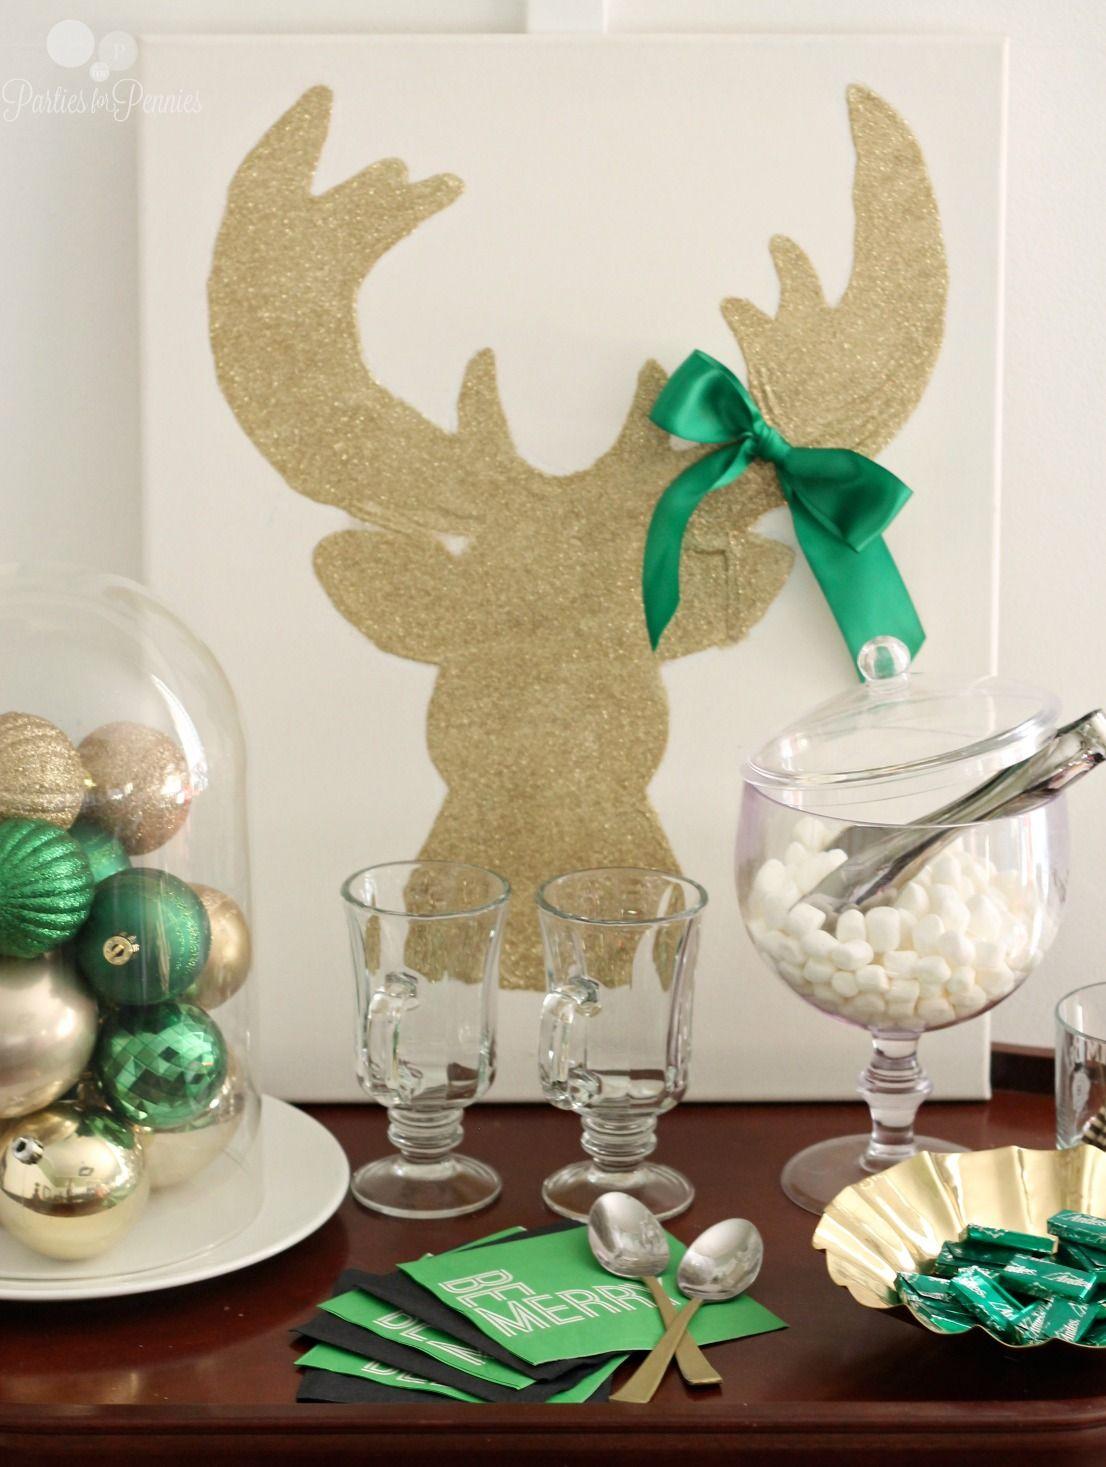 10 Budget Friendly Christmas Entertaining Ideas - Parties for Pennies | Christmas entertaining ...